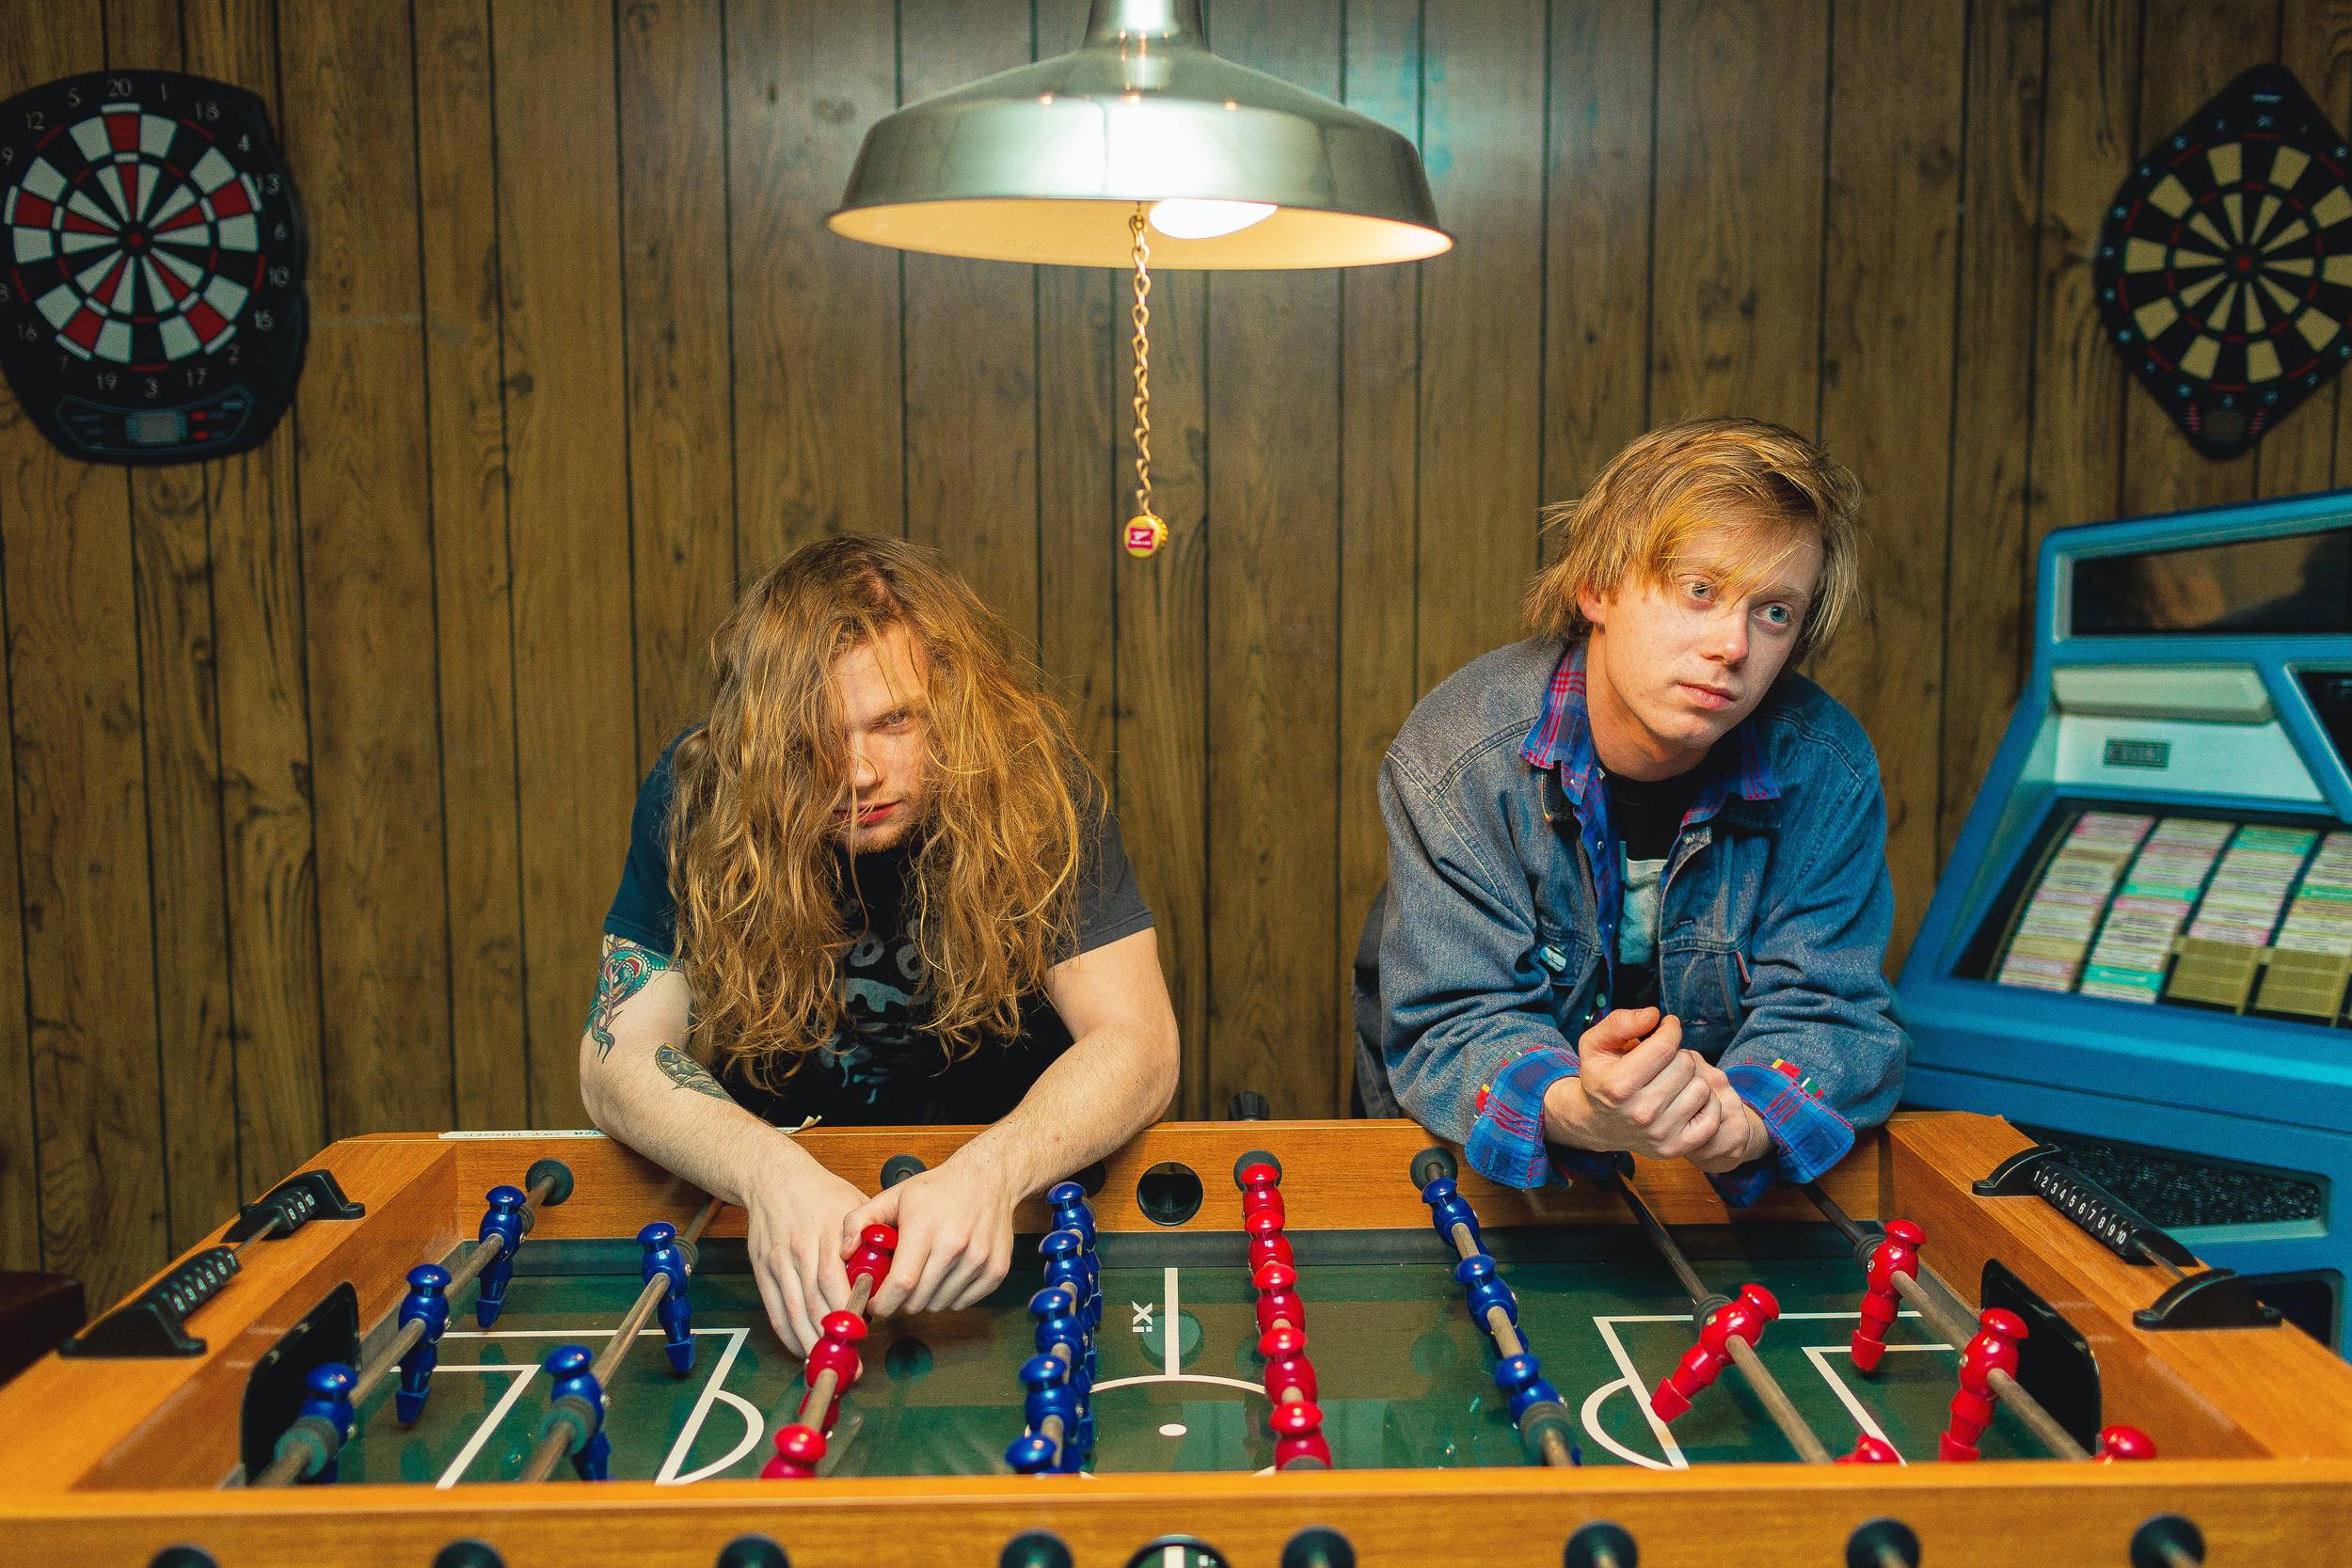 Zach and Greyson